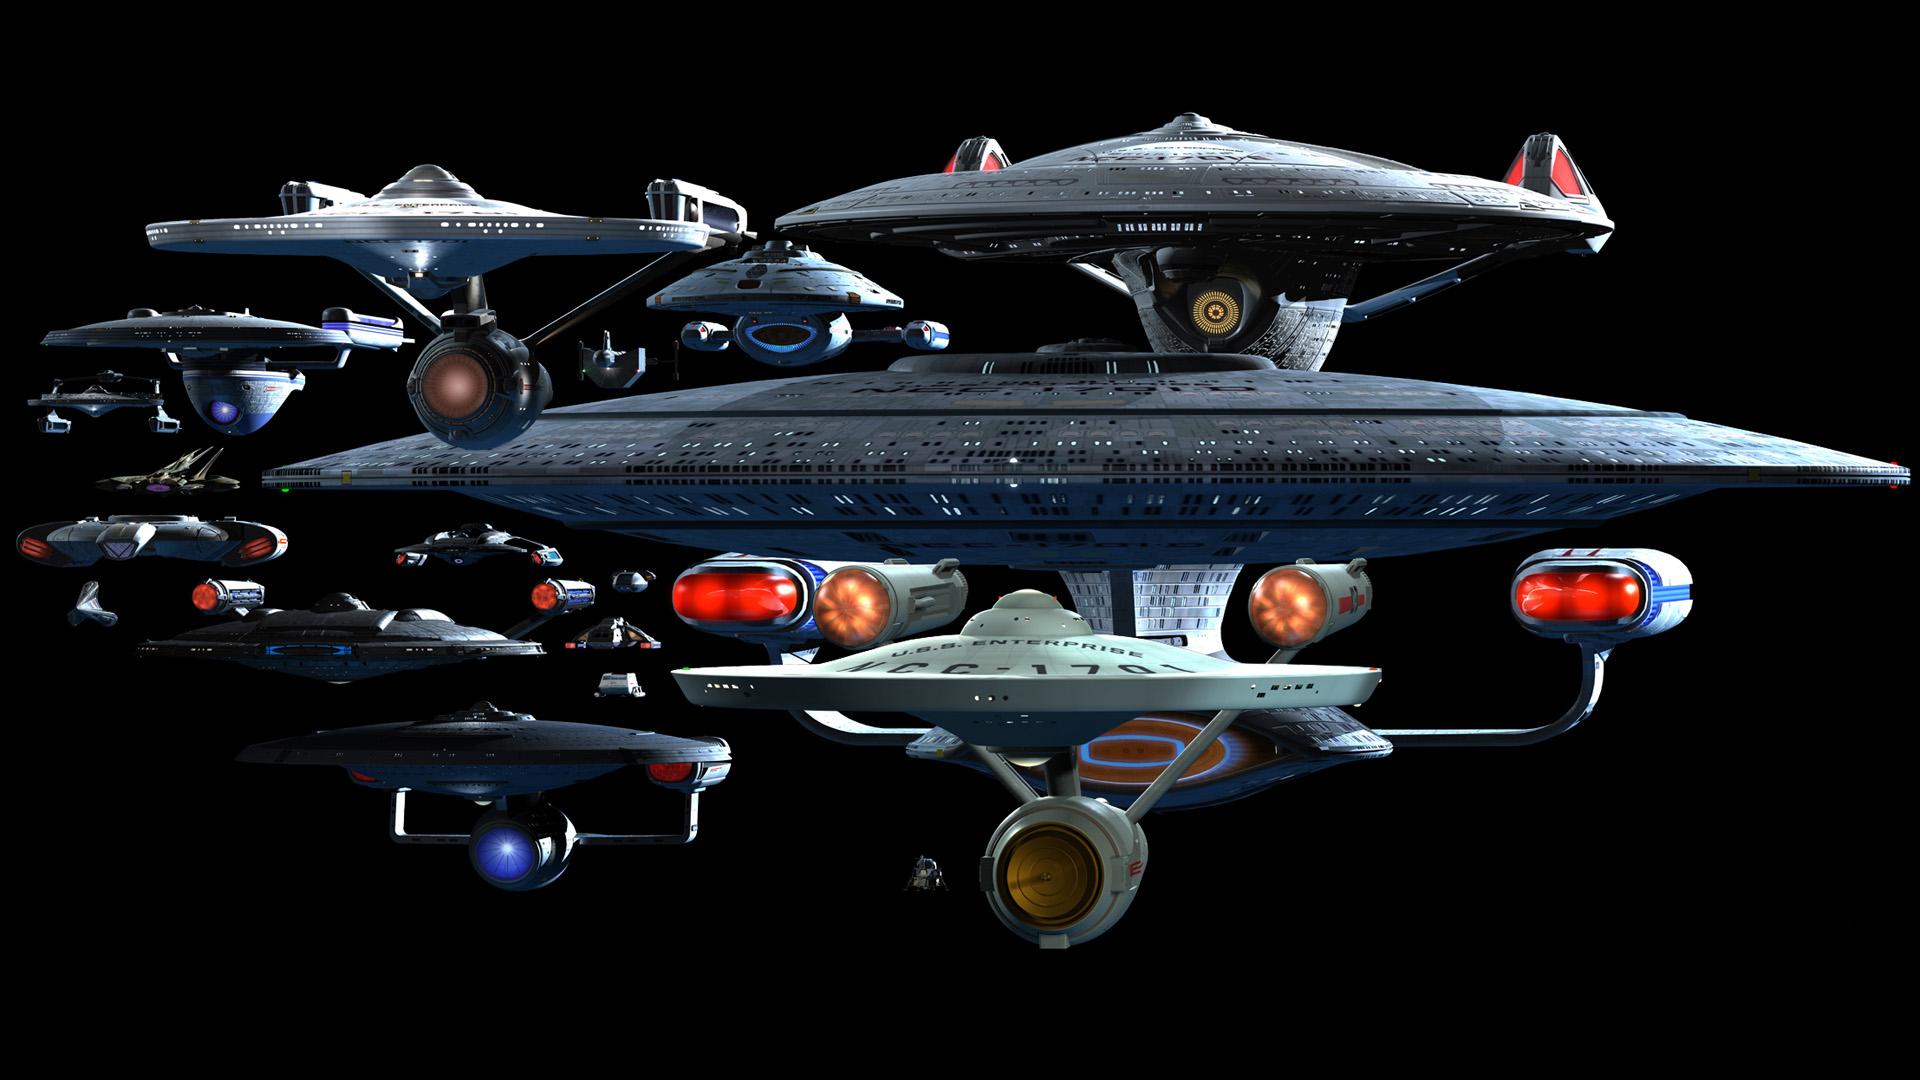 Wallpaper Abyss Explore the Collection Star Trek Sci Fi Star Trek 1920x1080